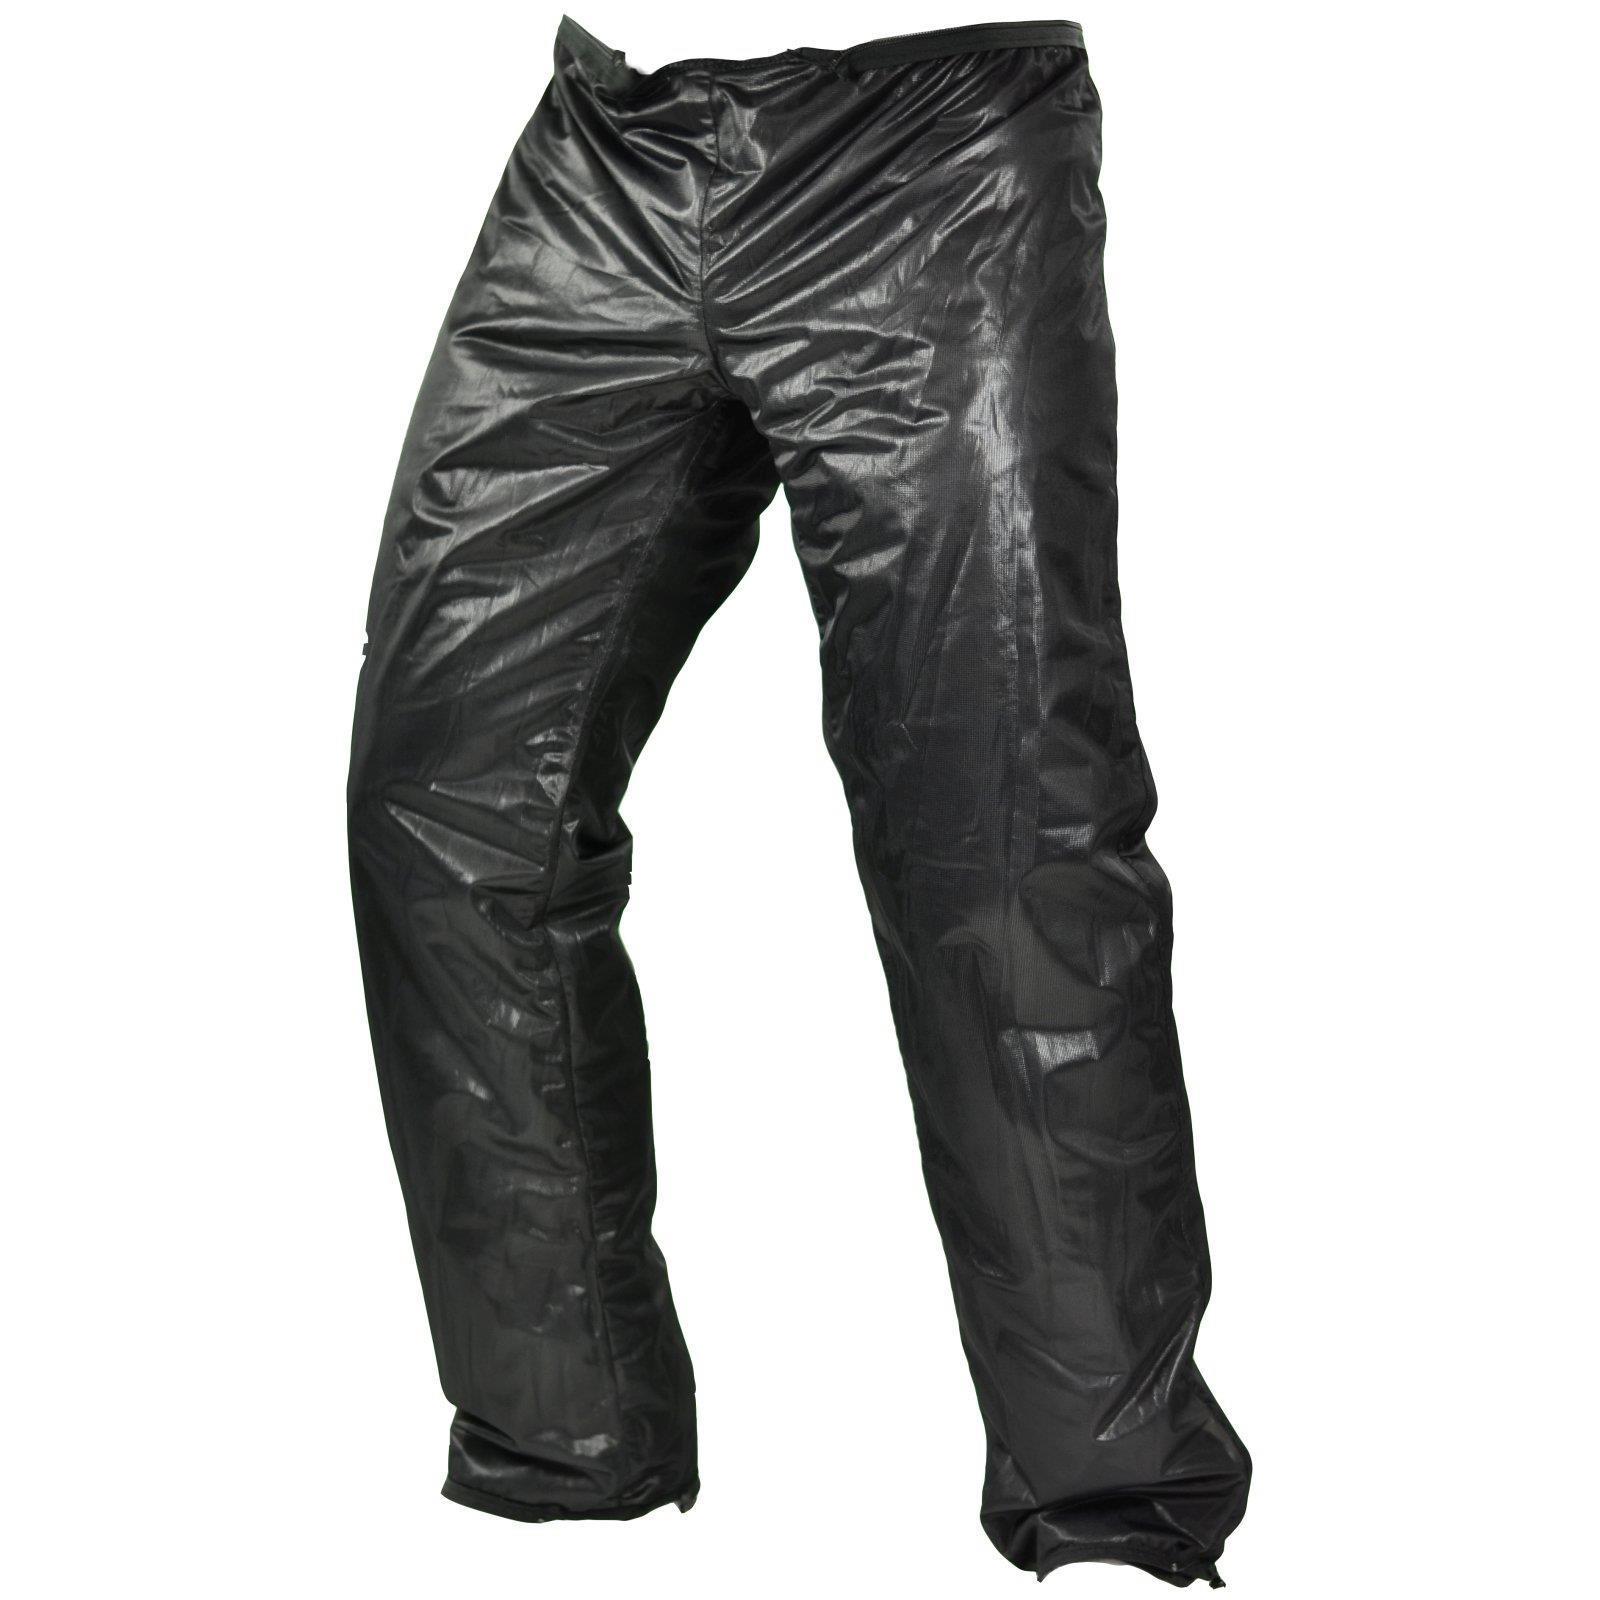 Trilobite-Pantaloni-Moto-Jeans-Abbigliamento-Parado-MICAS-URBAN-DUAL-PANTS-ACID miniatura 90